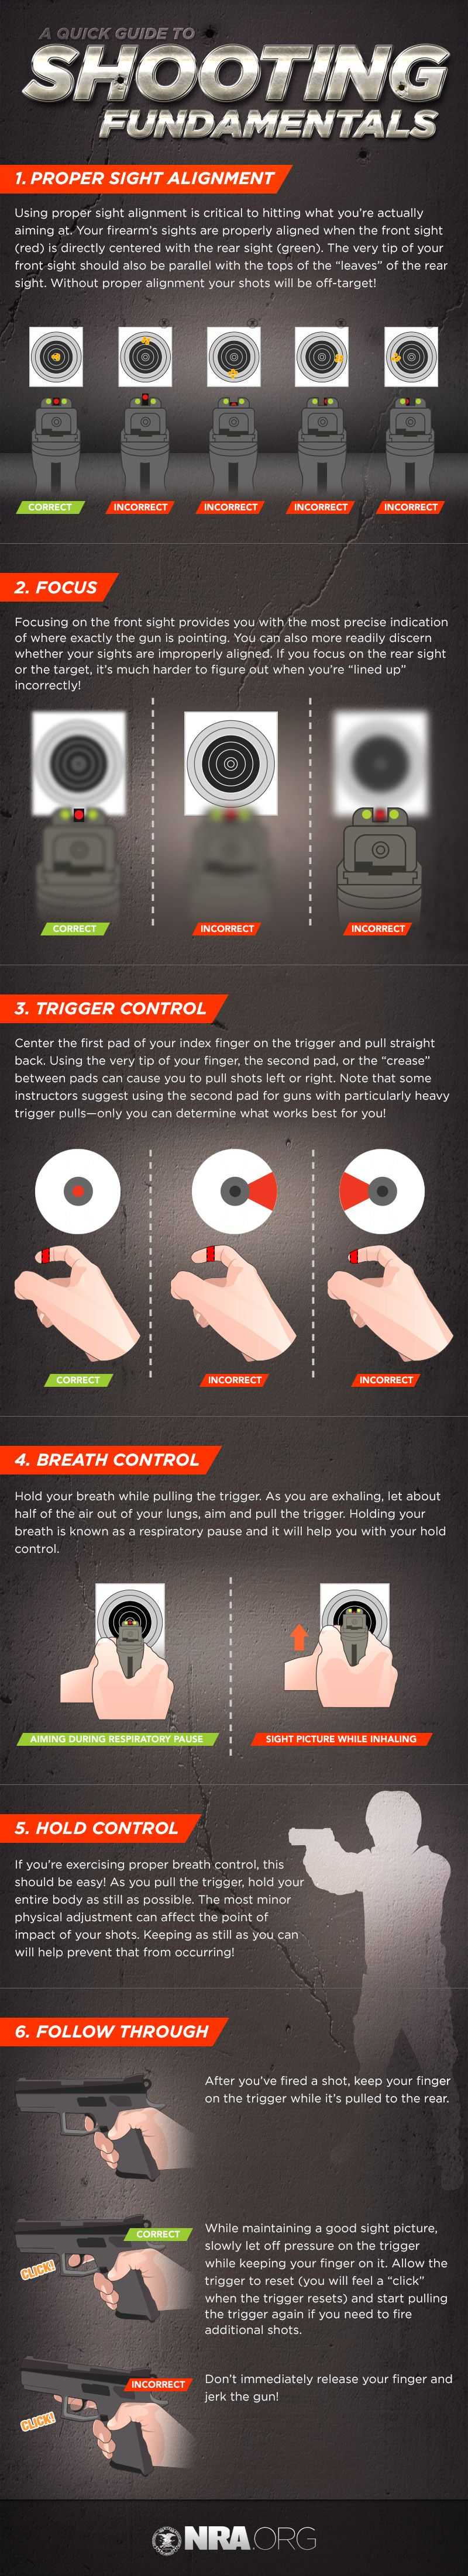 marksmanship fundamentals improve your shooting by mastering the basics